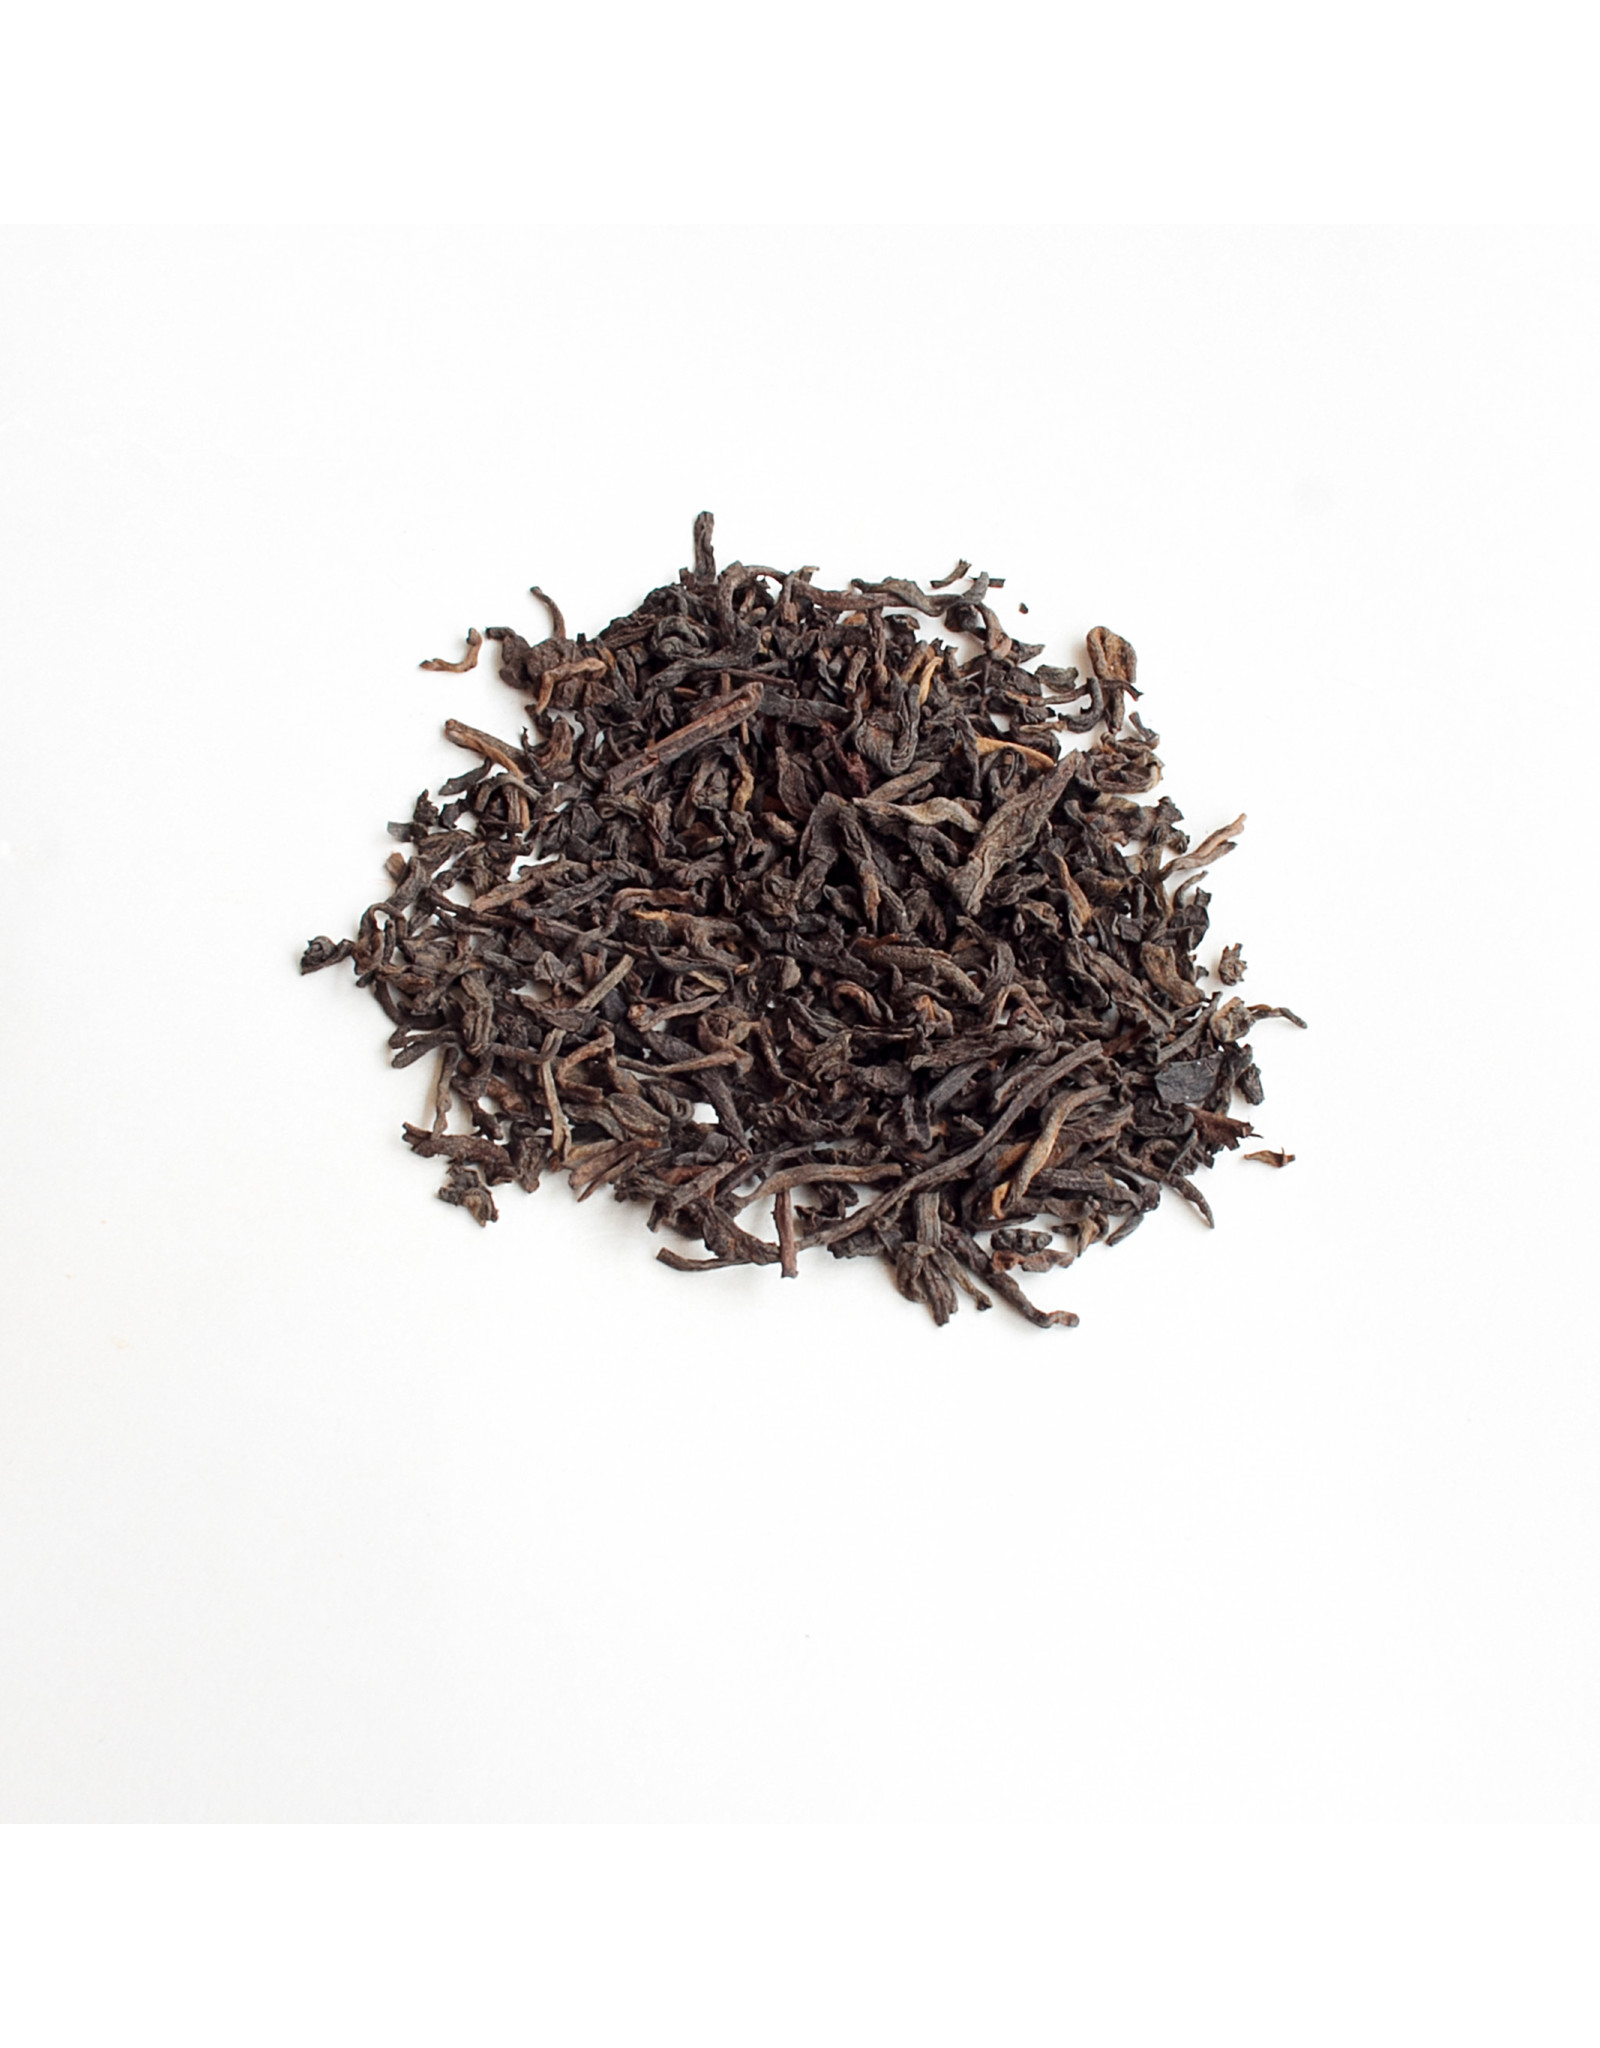 Les Thés Fuji Thé Noir Pu'erh 3 ans 90g